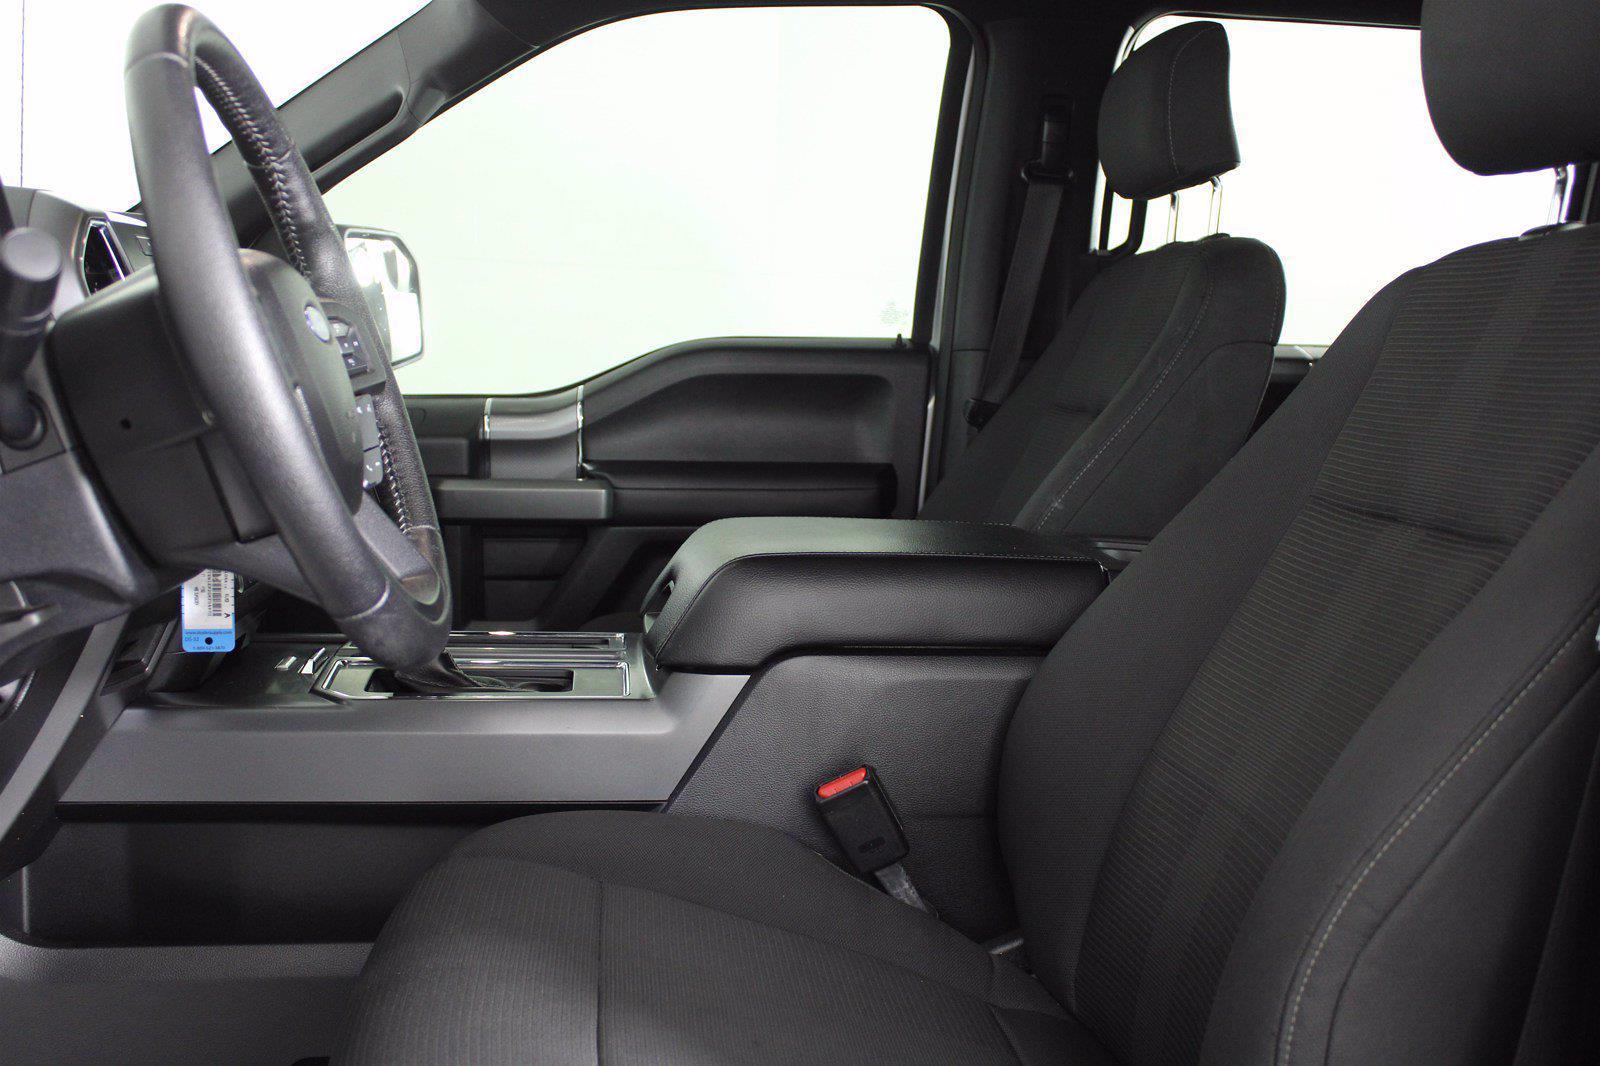 2016 Ford F-150 SuperCrew Cab 4x4, Pickup #D110467A - photo 7